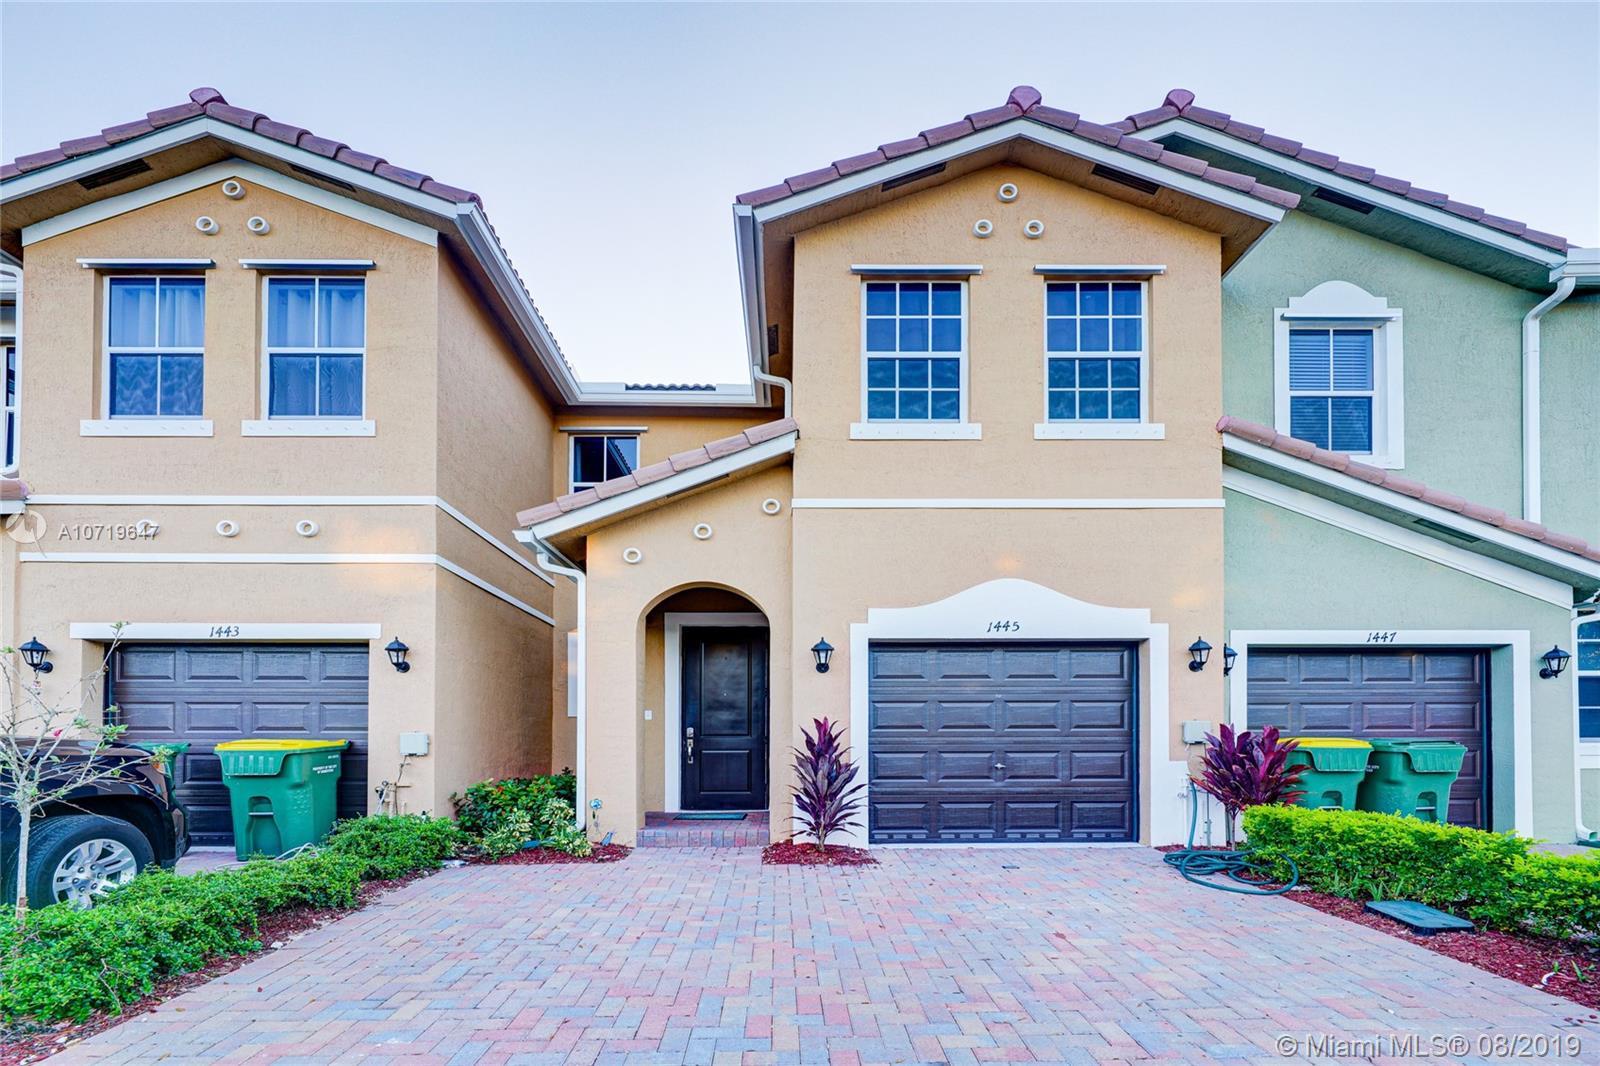 1445 SE 26 AVE #1445, Homestead, FL 33035 - Homestead, FL real estate listing